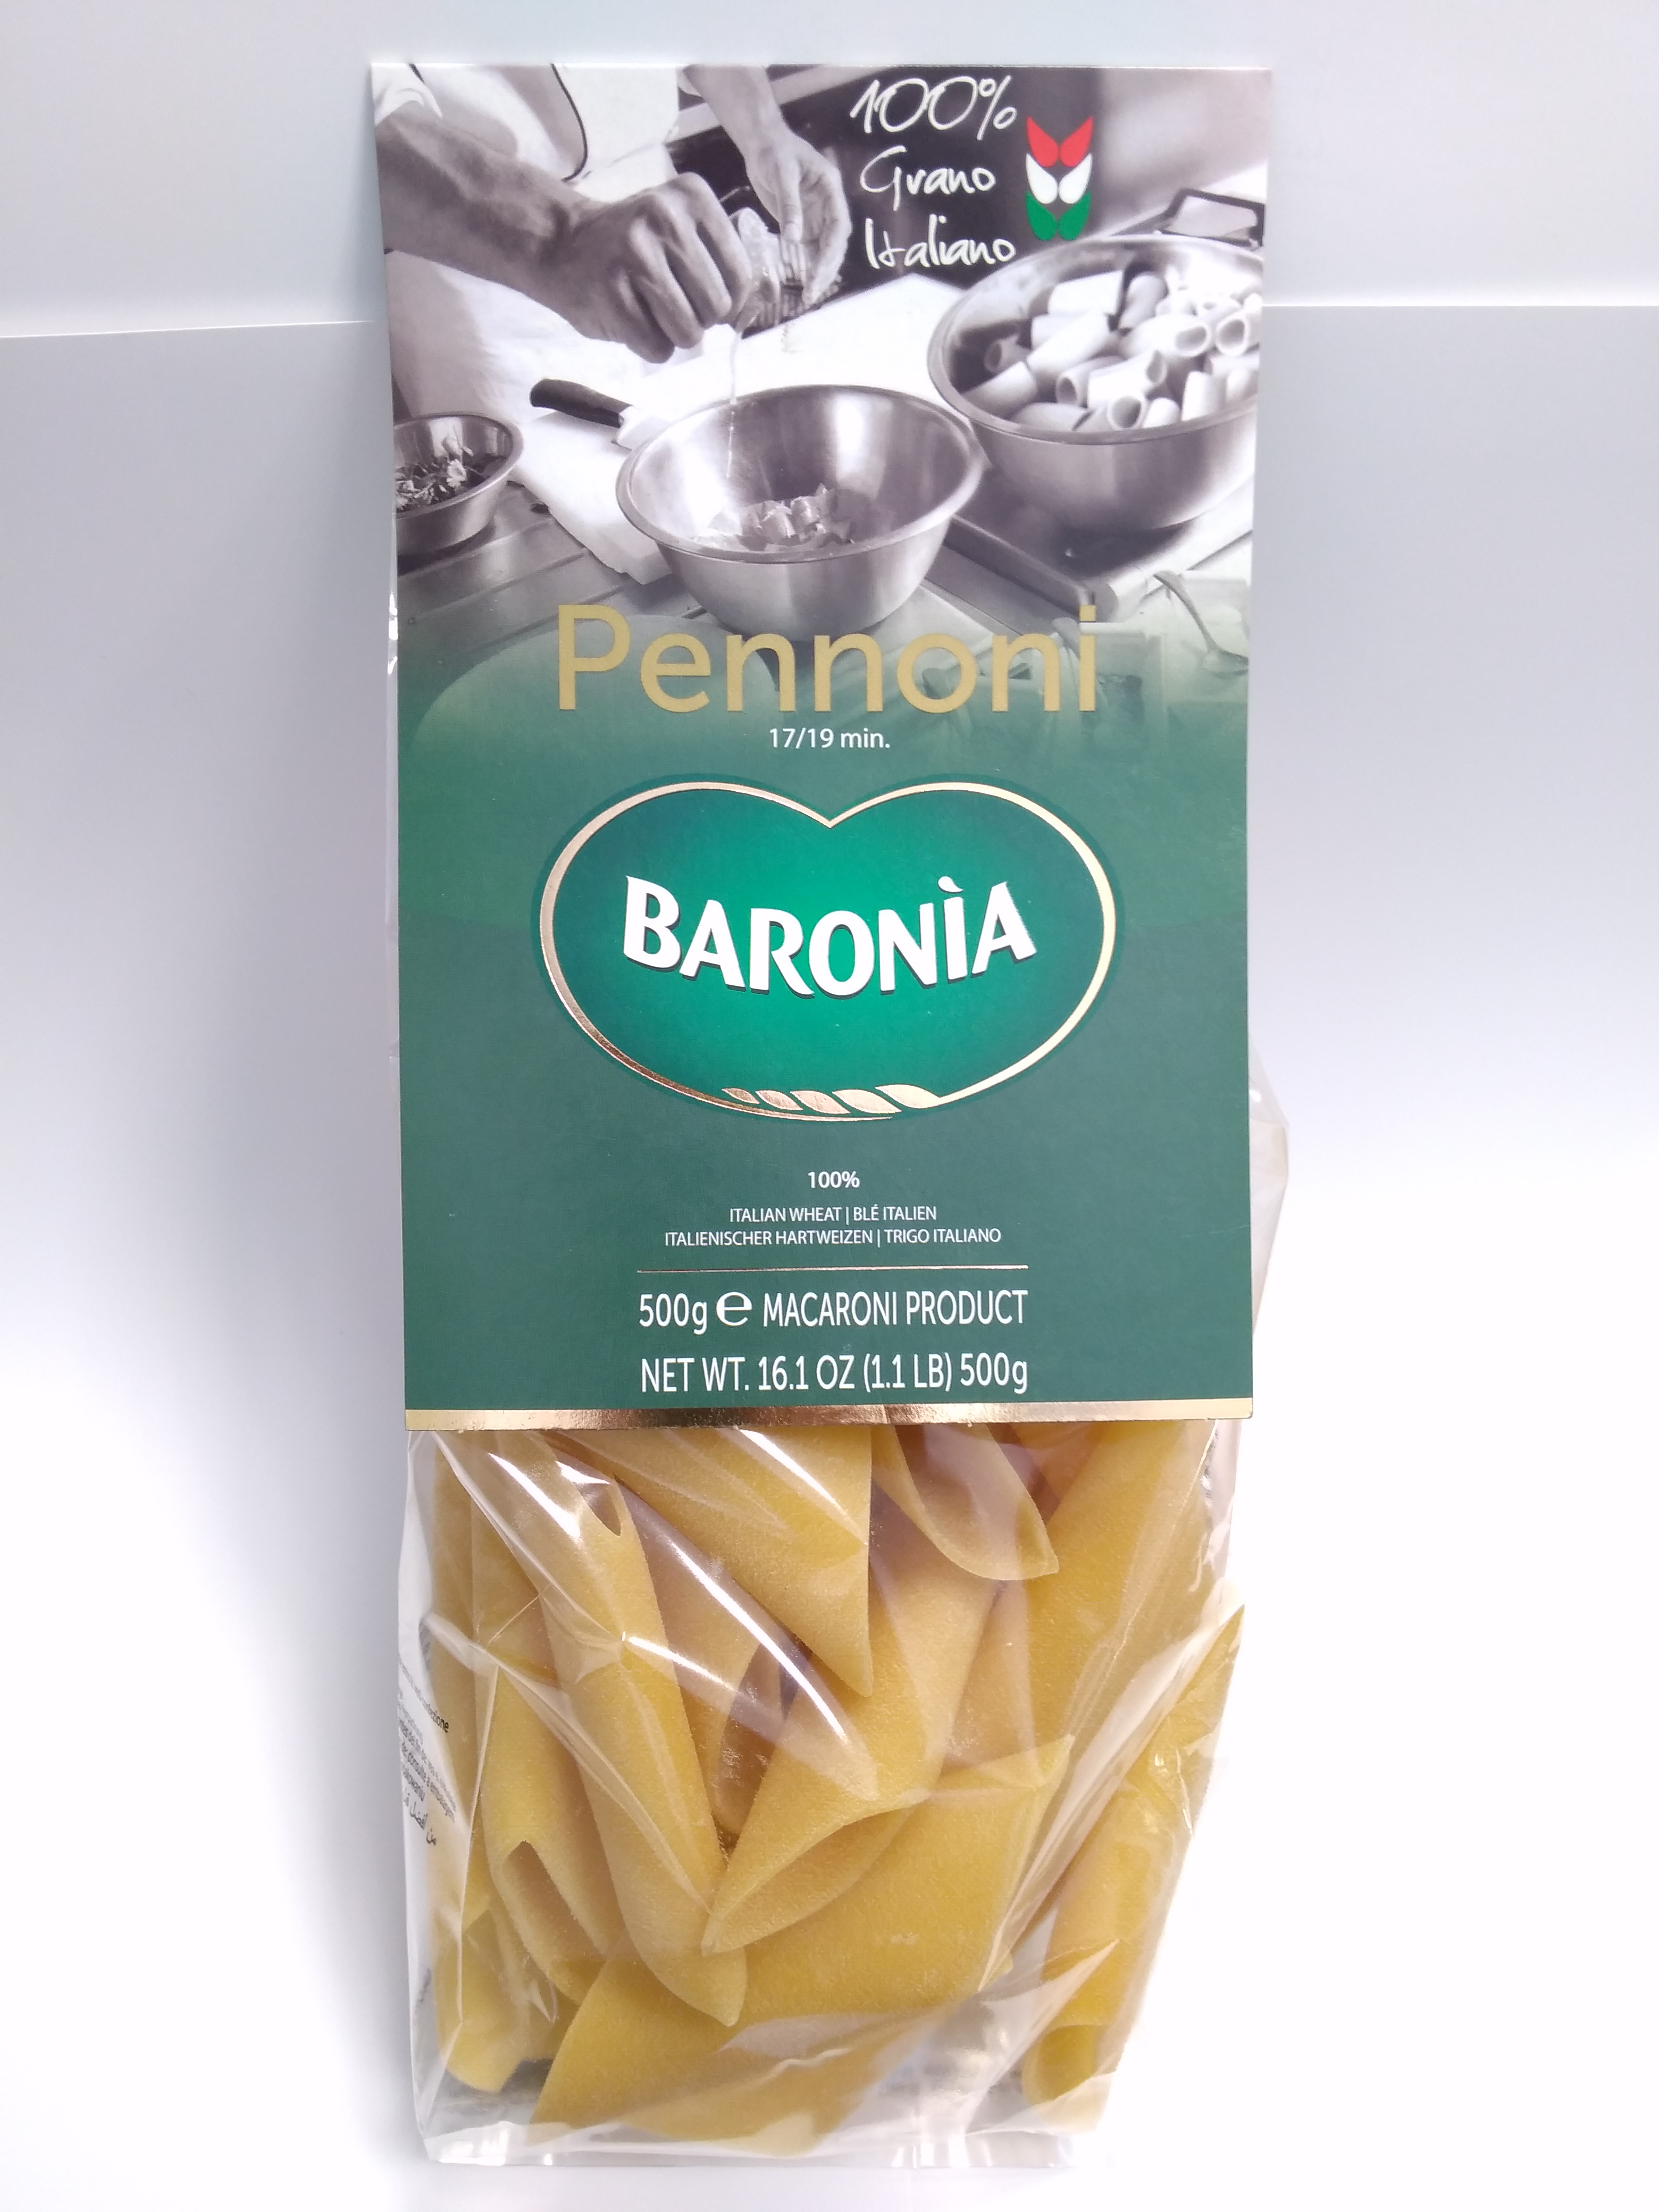 Pennoni Гиганти